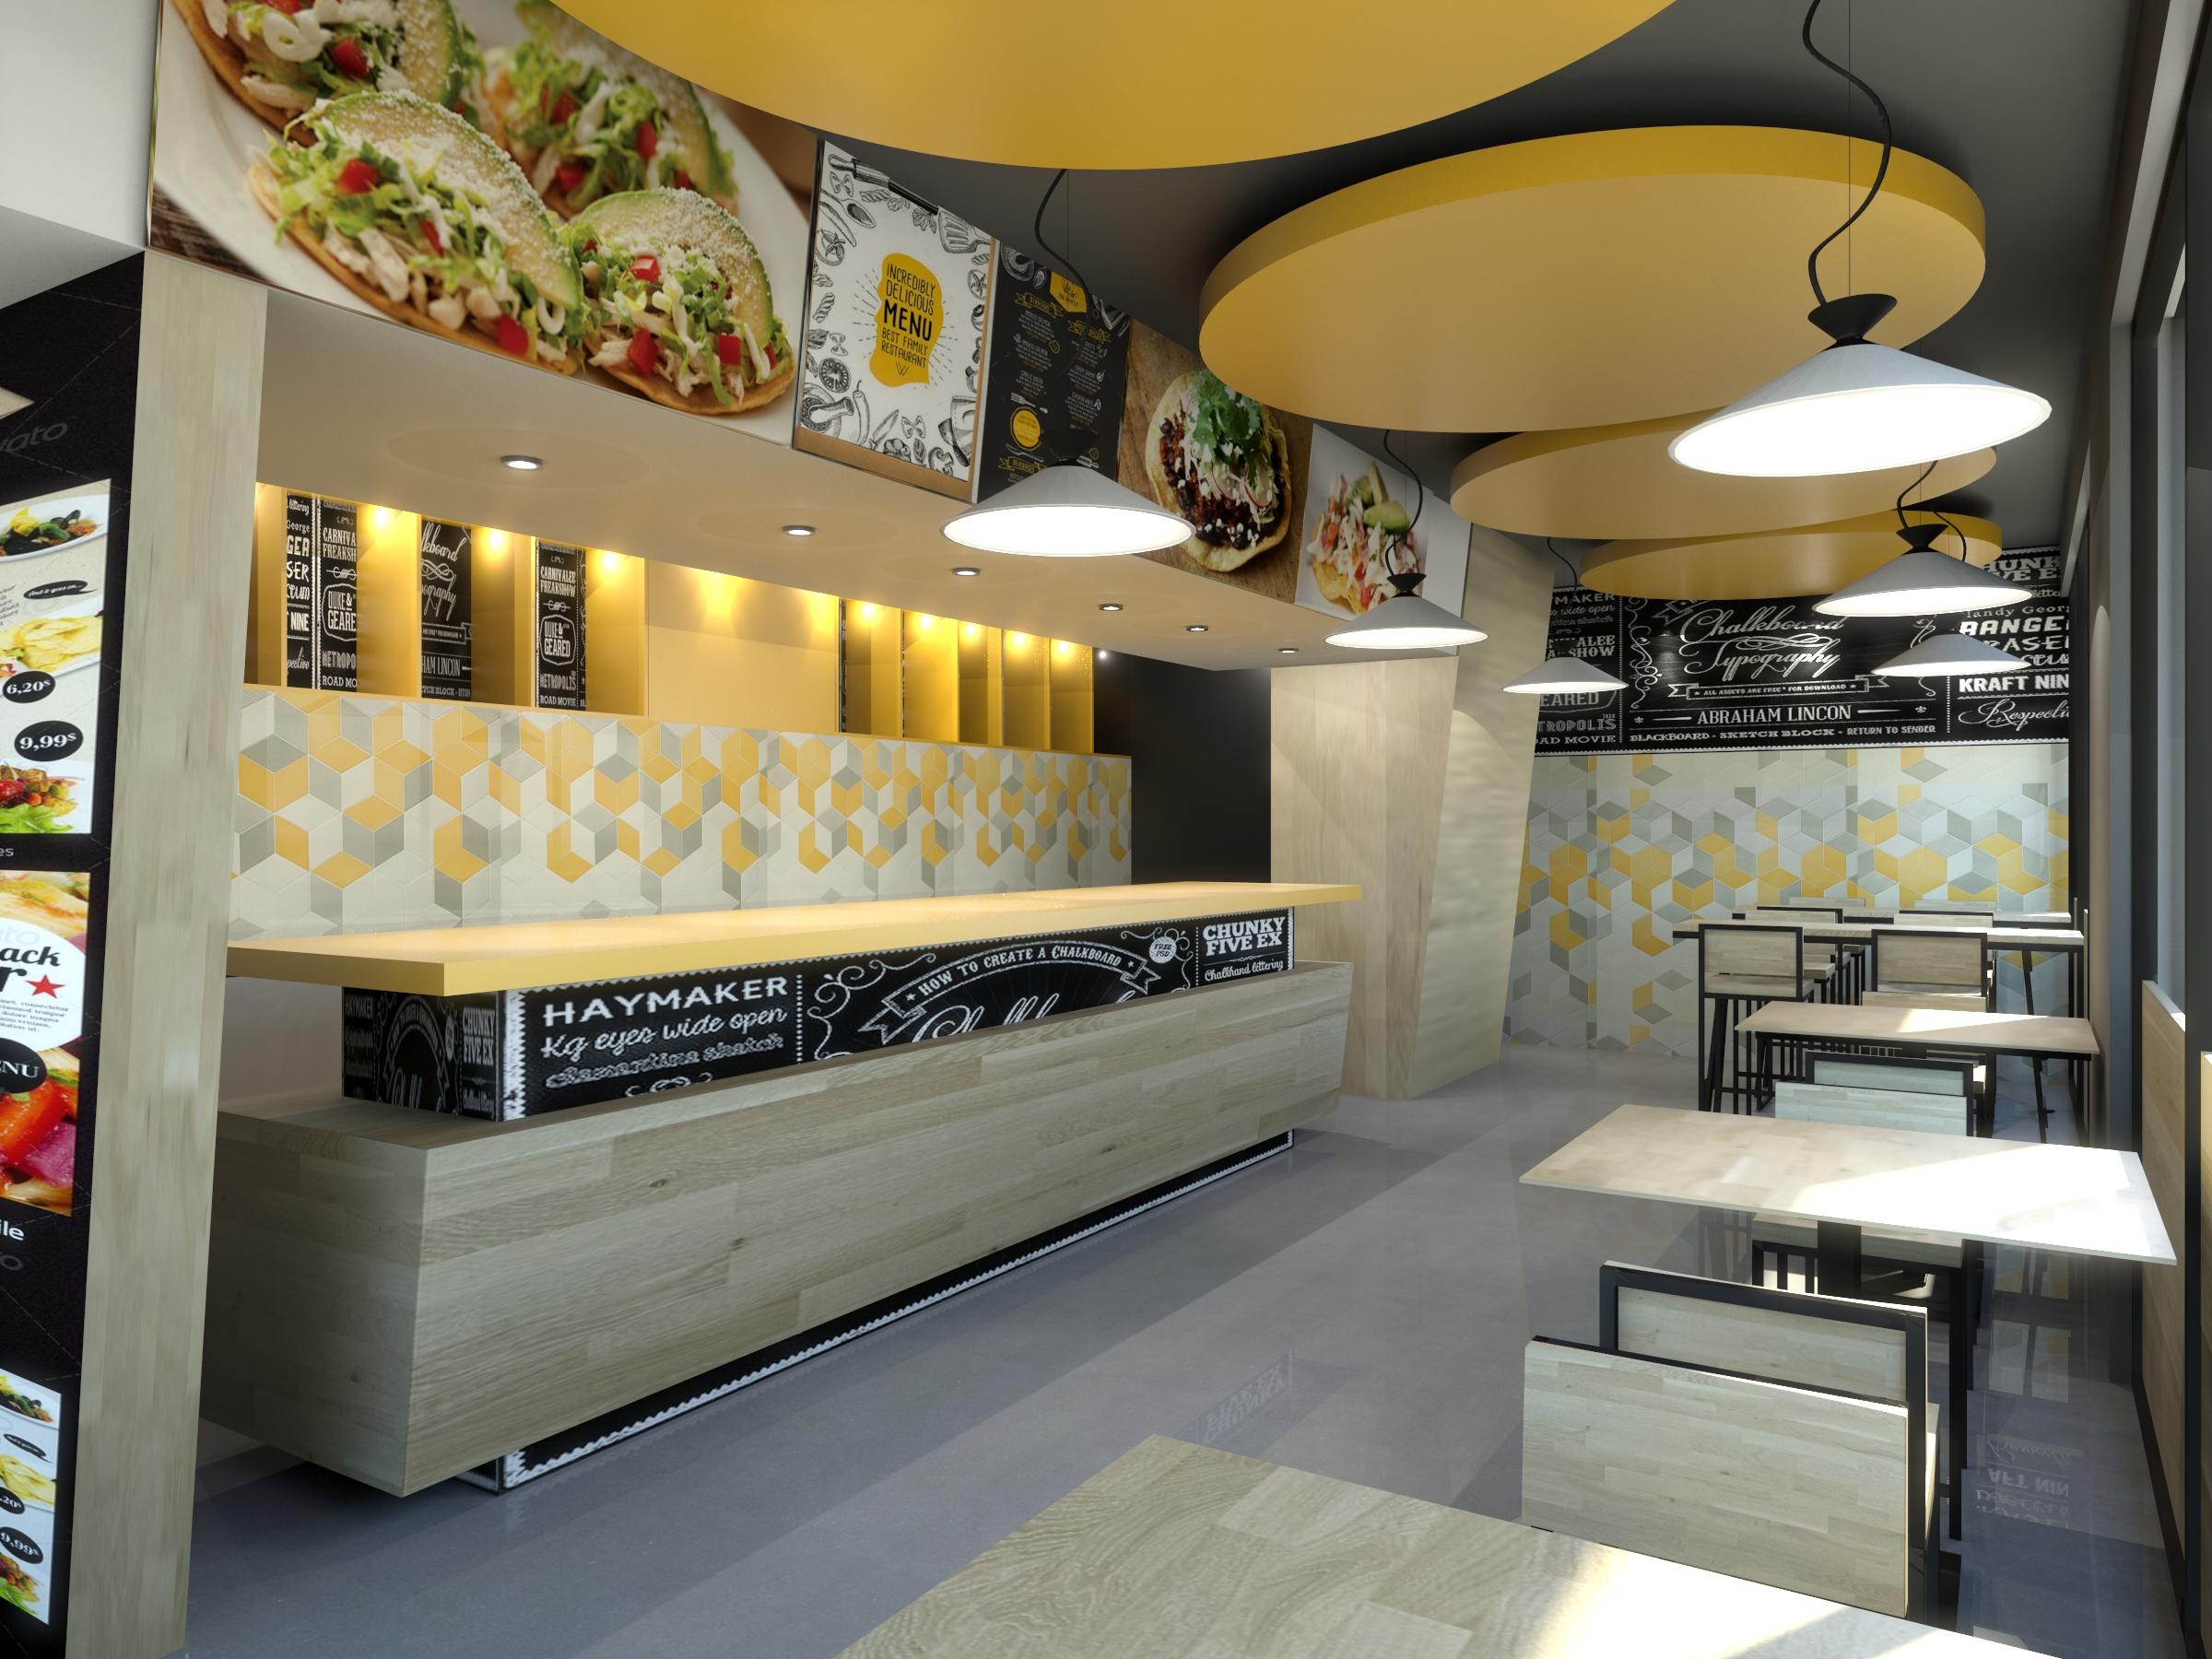 Dise o de interiores de restaurantes grupo mobilart - Paginas de diseno de interiores ...